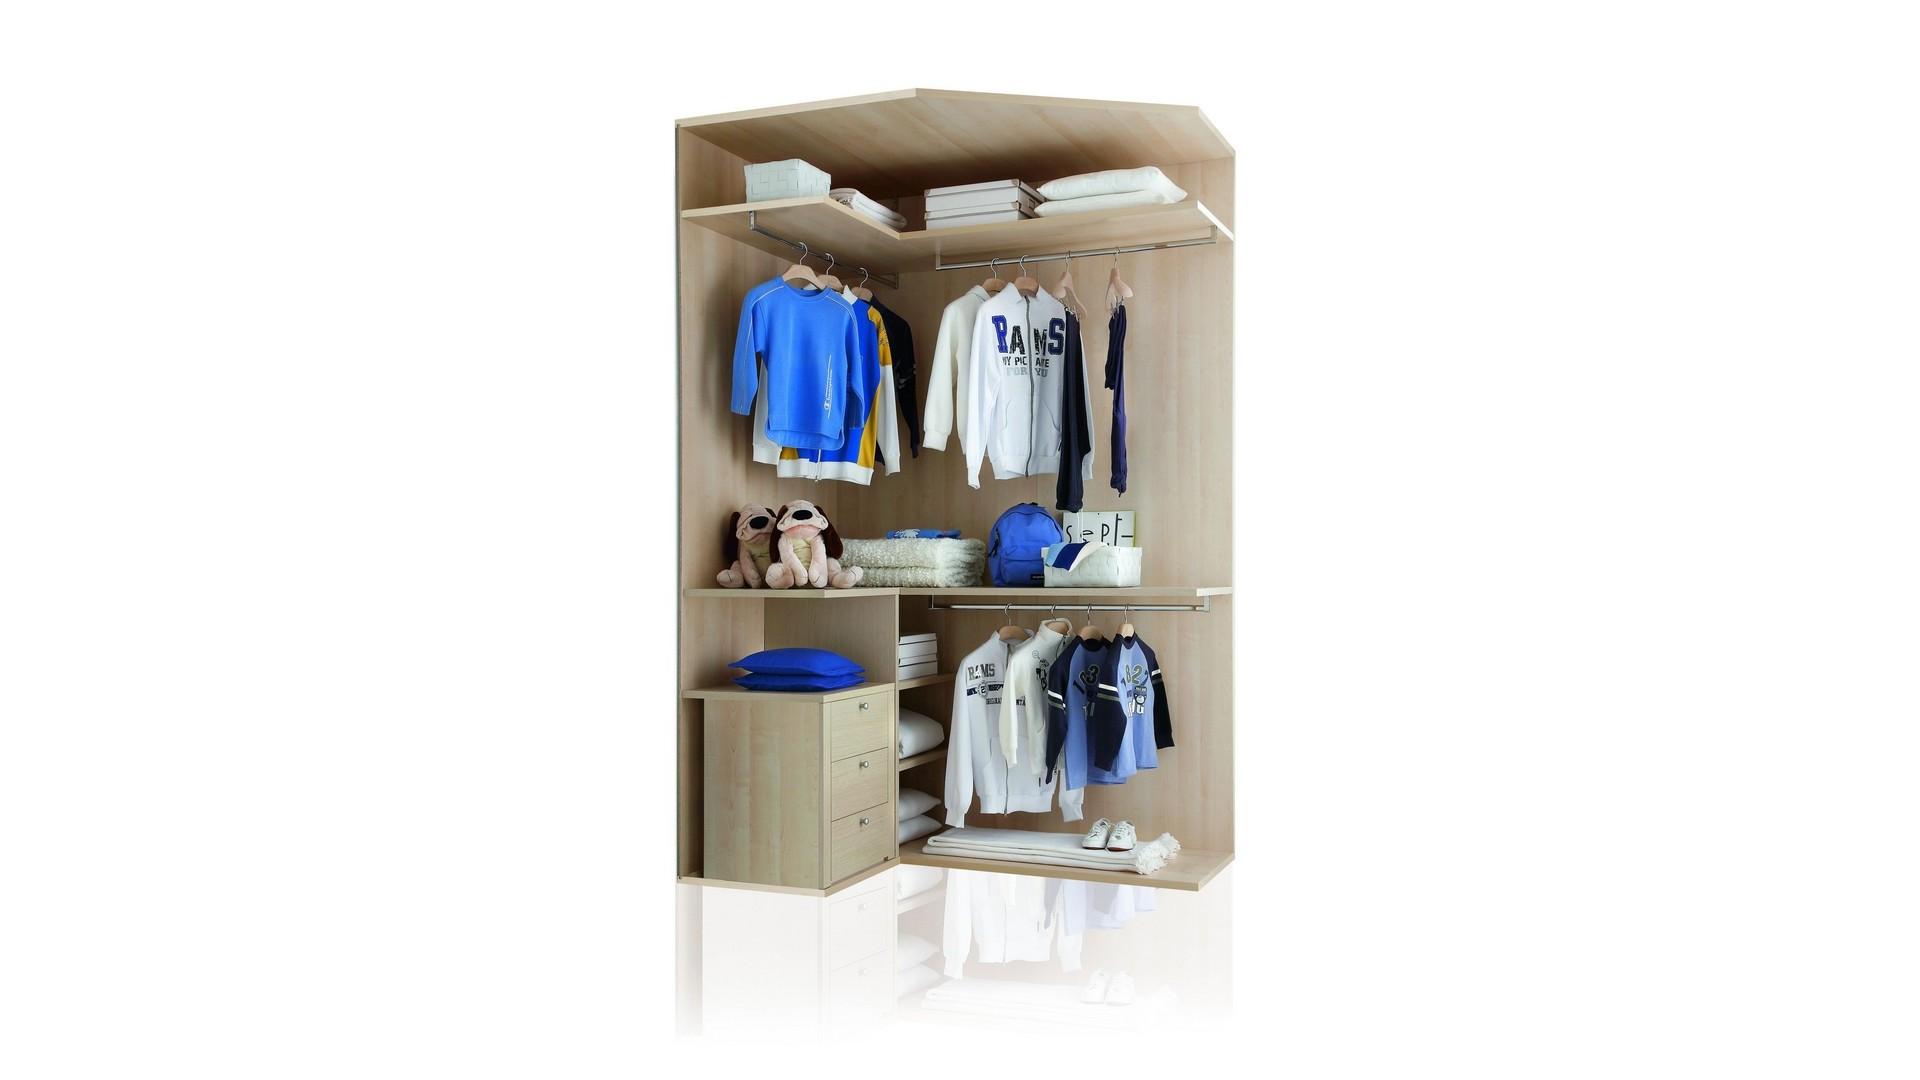 Cabine armadio modulari per camerette - Interni per cabine armadio ...